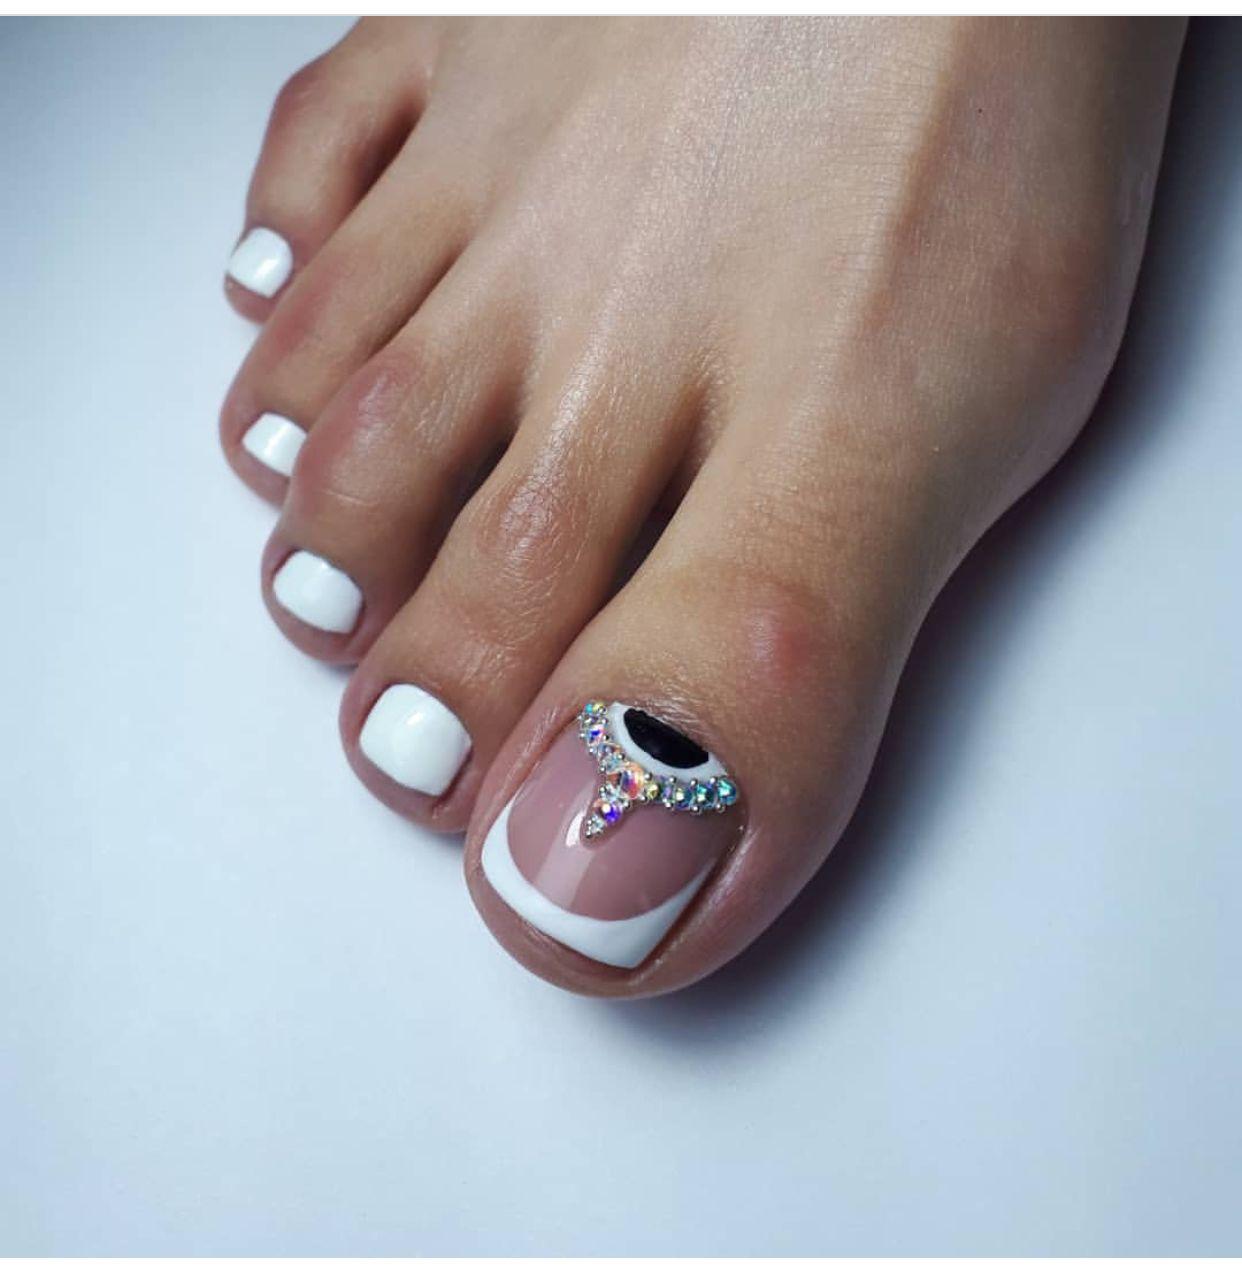 Pin Guadalupe Cruz Toe Nails In 2019 U Decoradas Pies Diseos Para